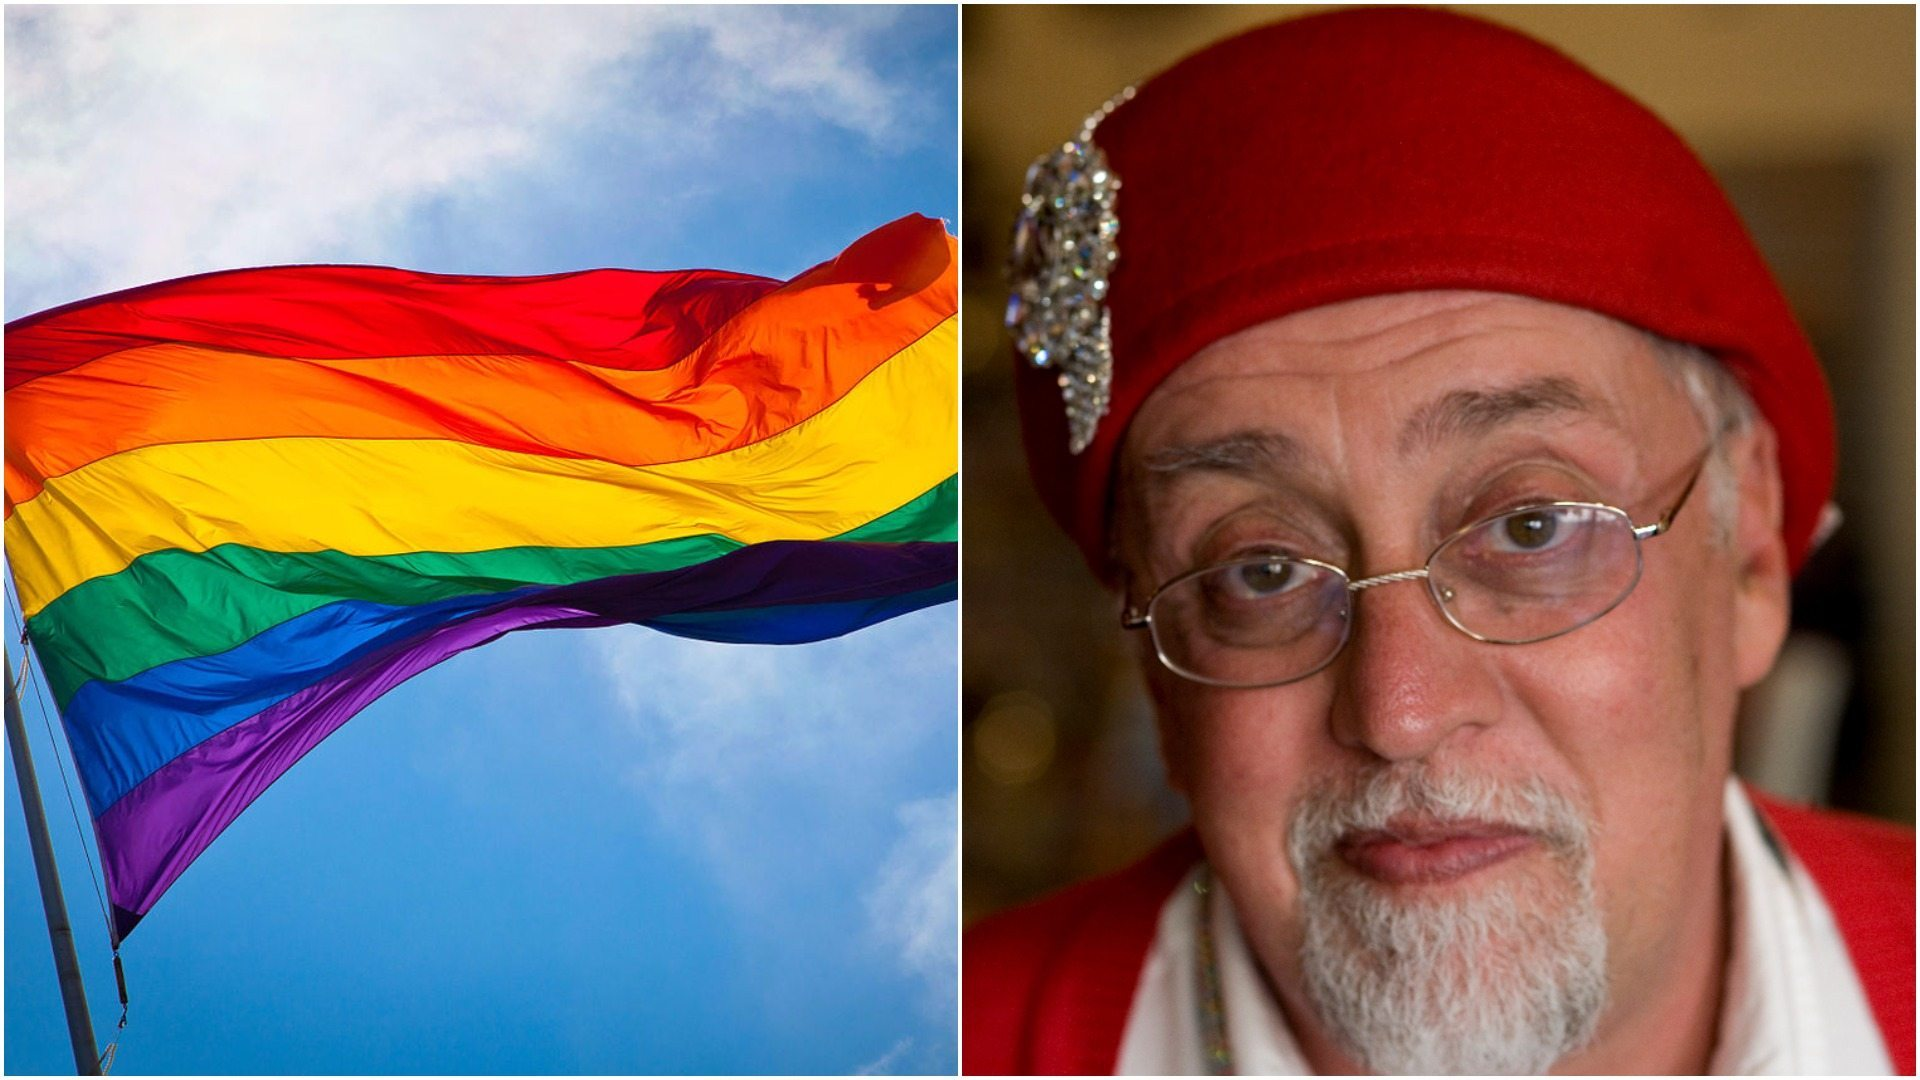 Zmarł twórca flagi homoseksualistów